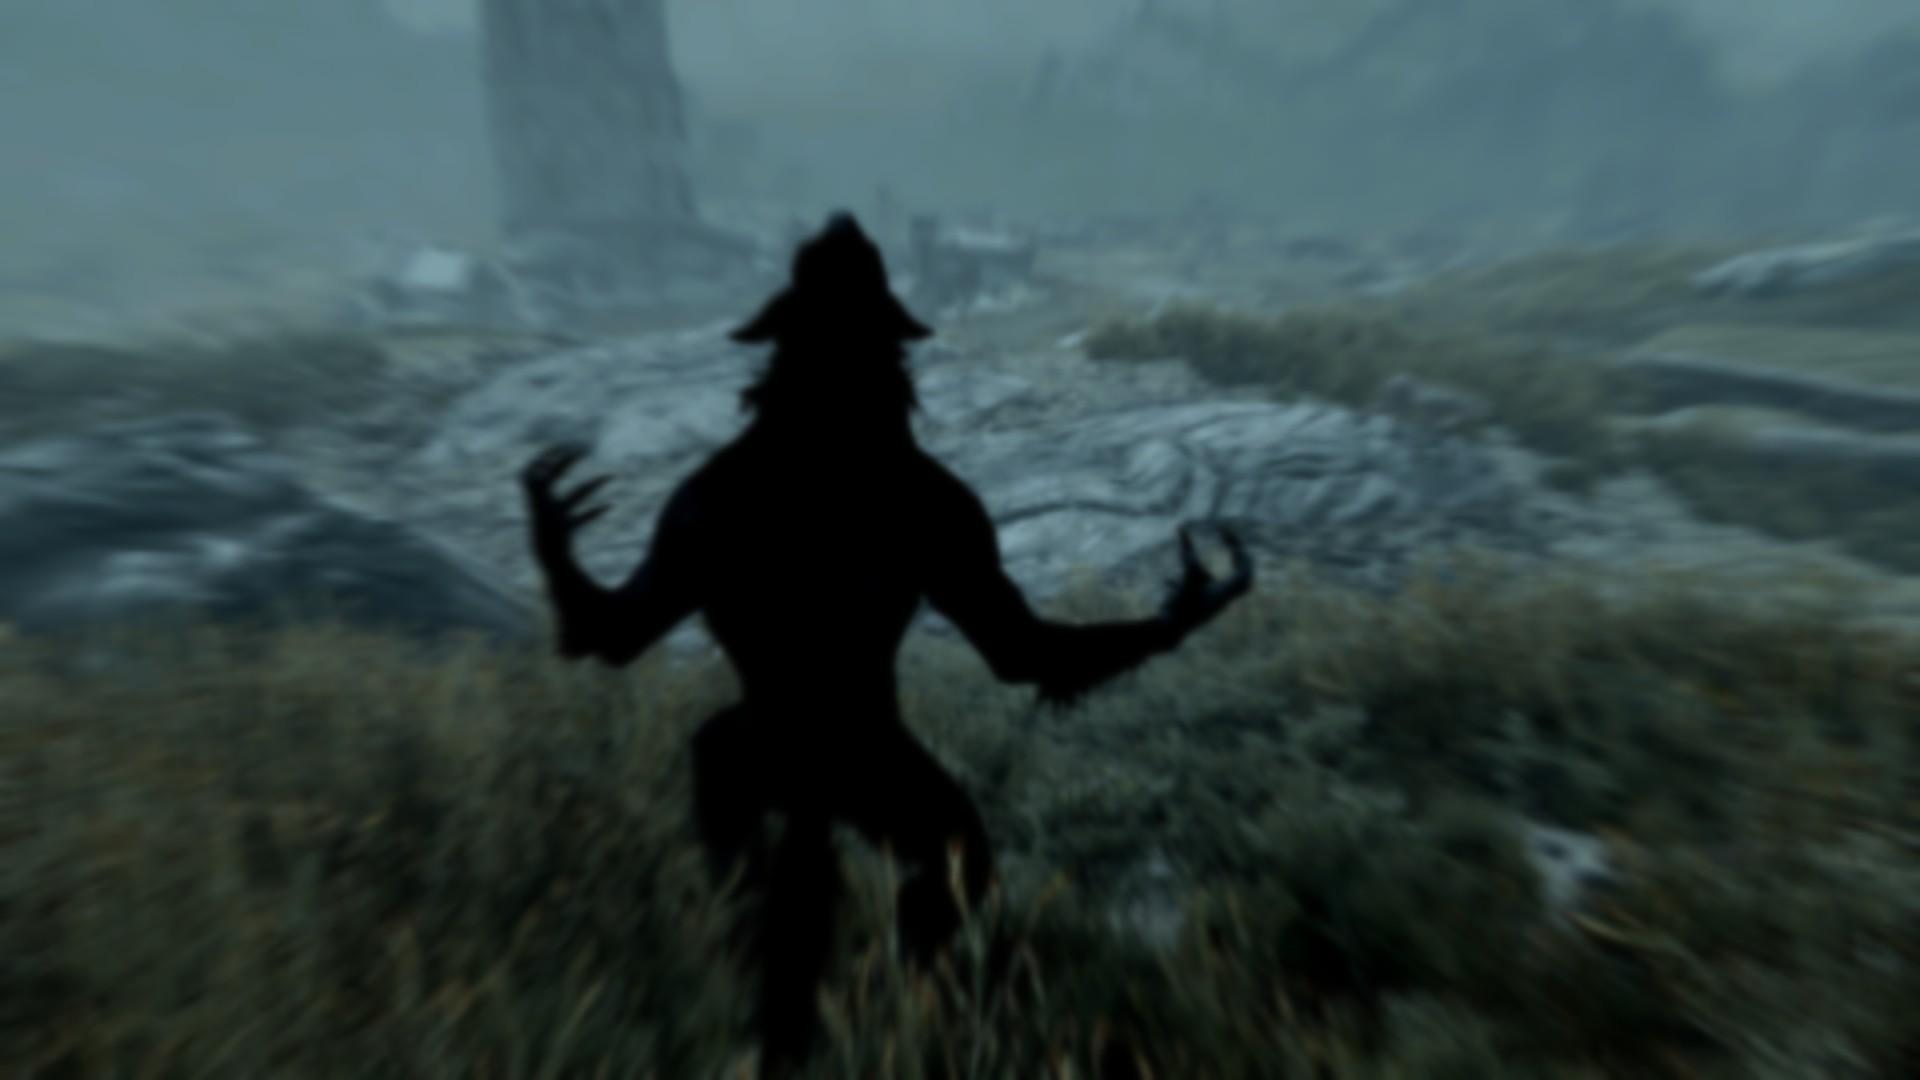 Elder Scrolls V: Skyrim - Lycanthropy (Werewolf Guide)